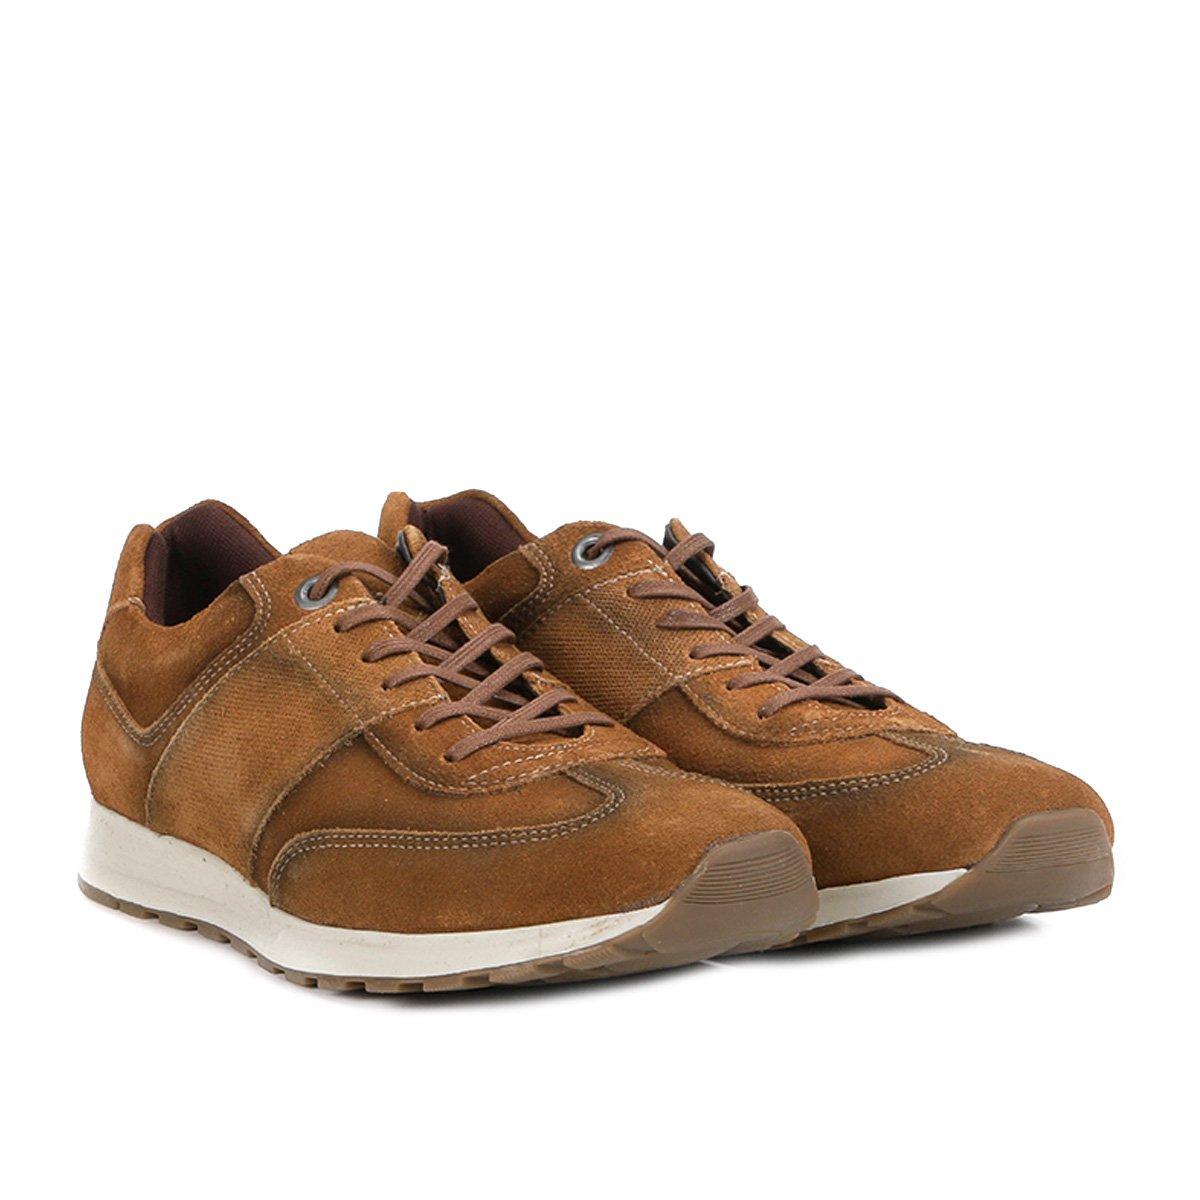 Tênis Couro Shoestock Jogging Masculino - Caramelo - Compre Agora ... 128e0affff2ad